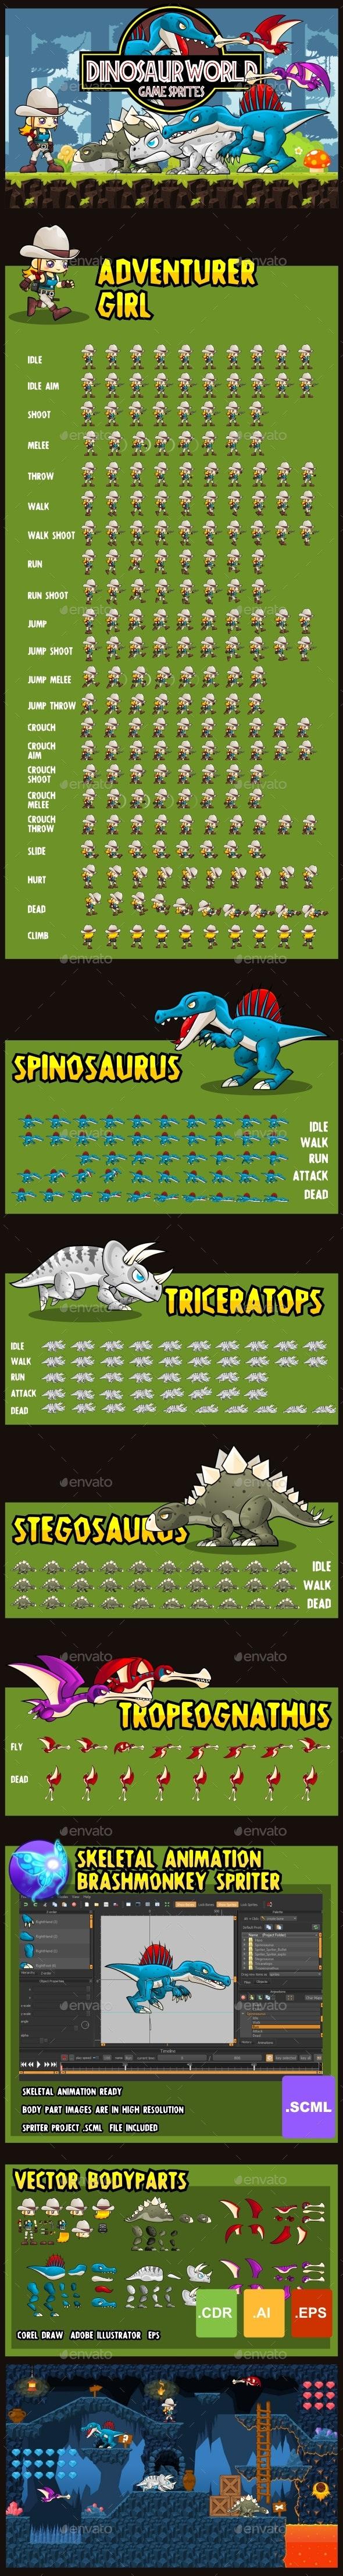 Dino World - Game Sprites - Sprites Game Assets